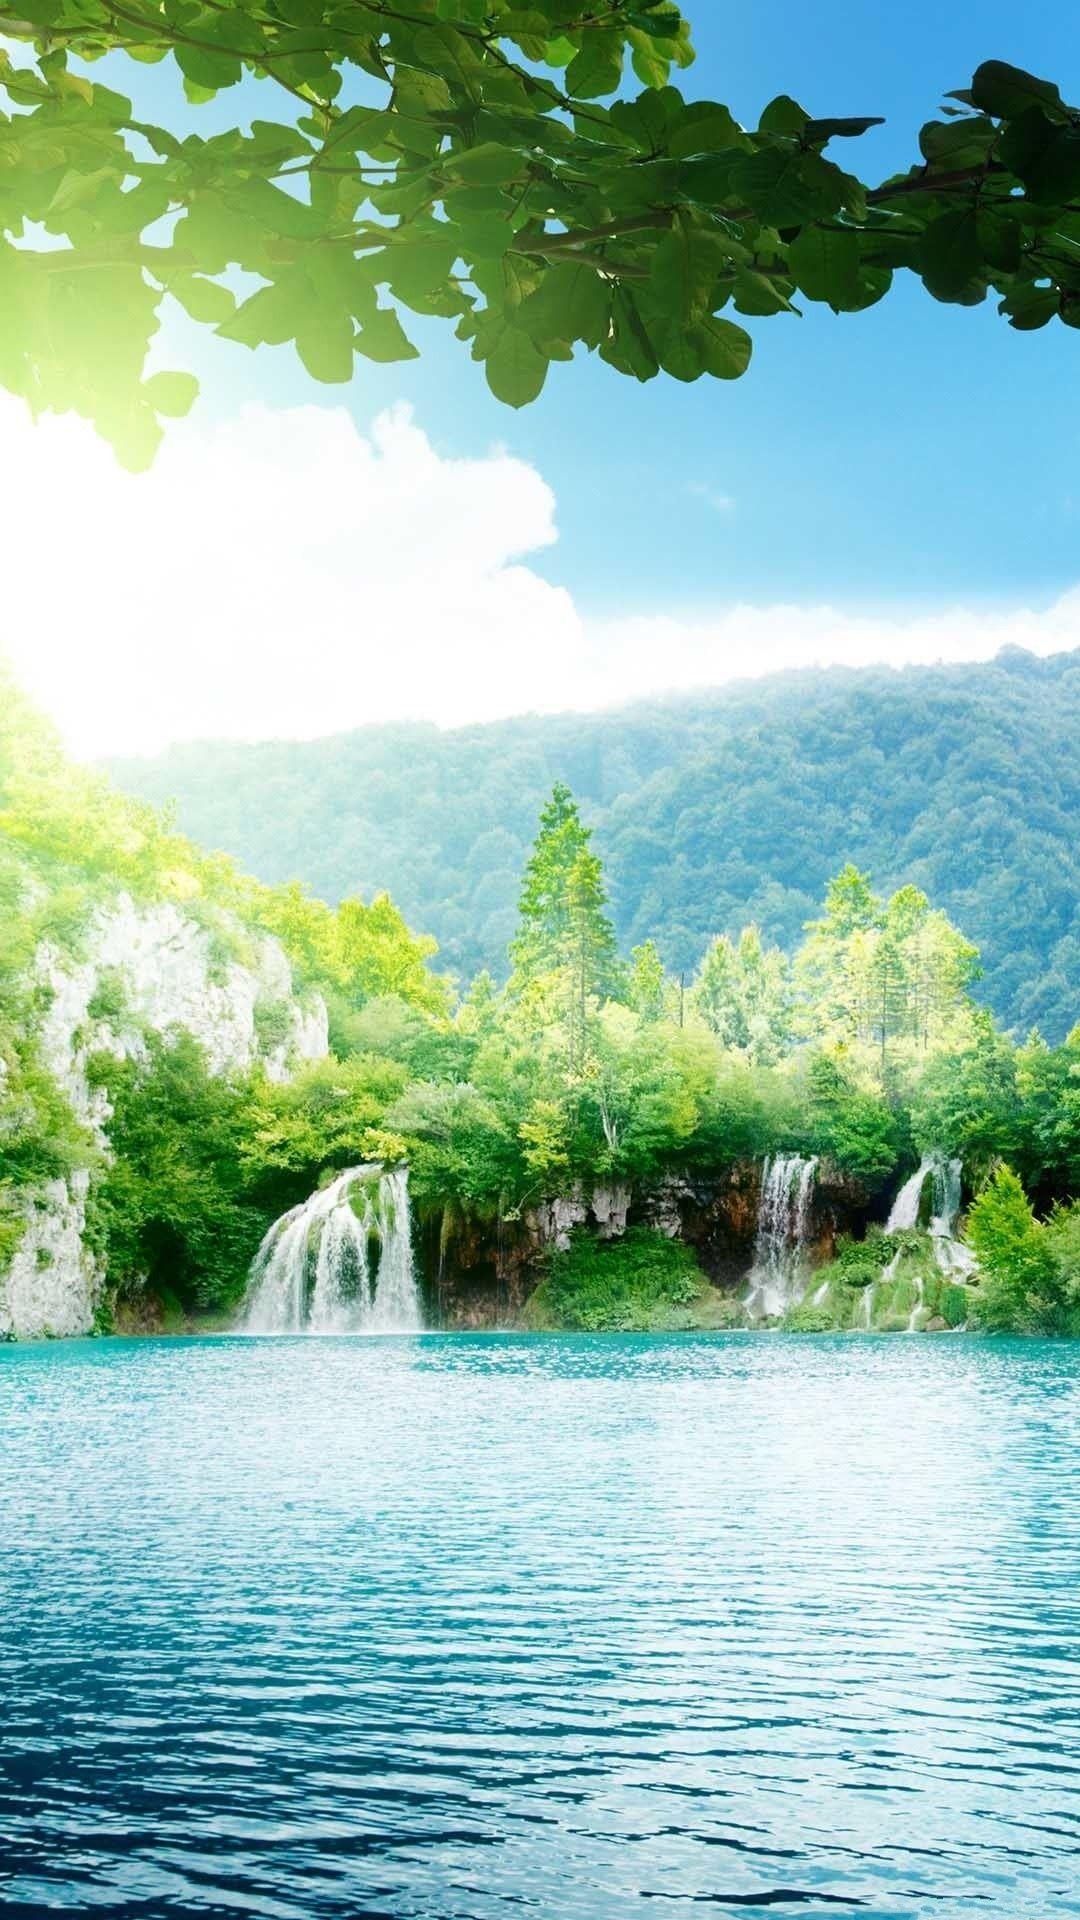 Nature iPhone 6 Plus Wallpapers Enchanting Lake